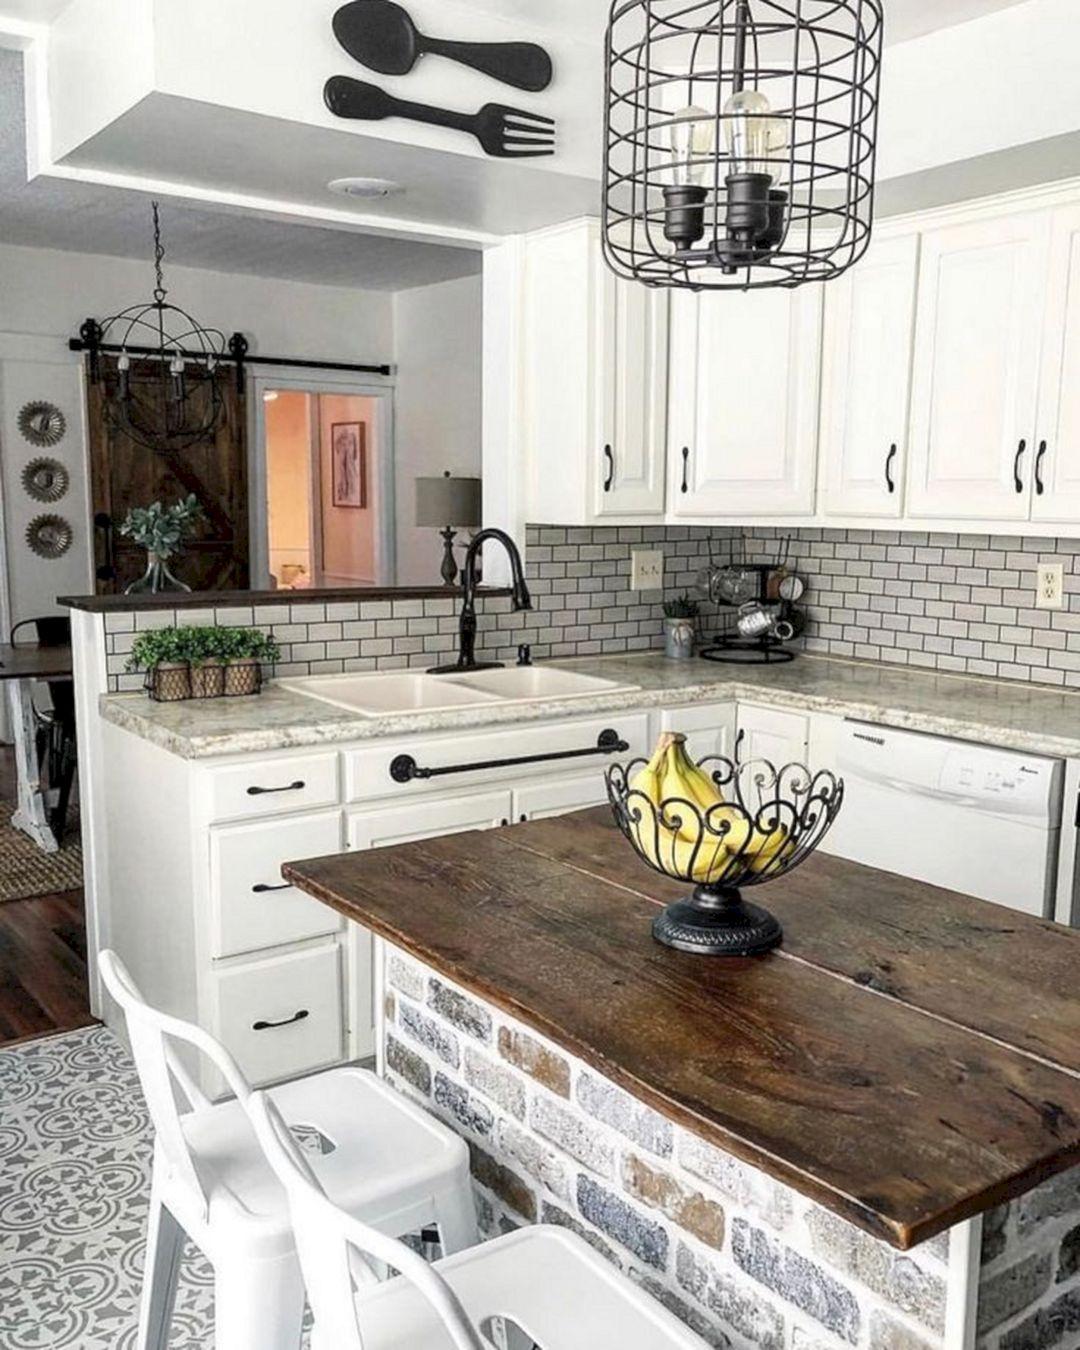 Rustic Farmhouse Kitchen Style